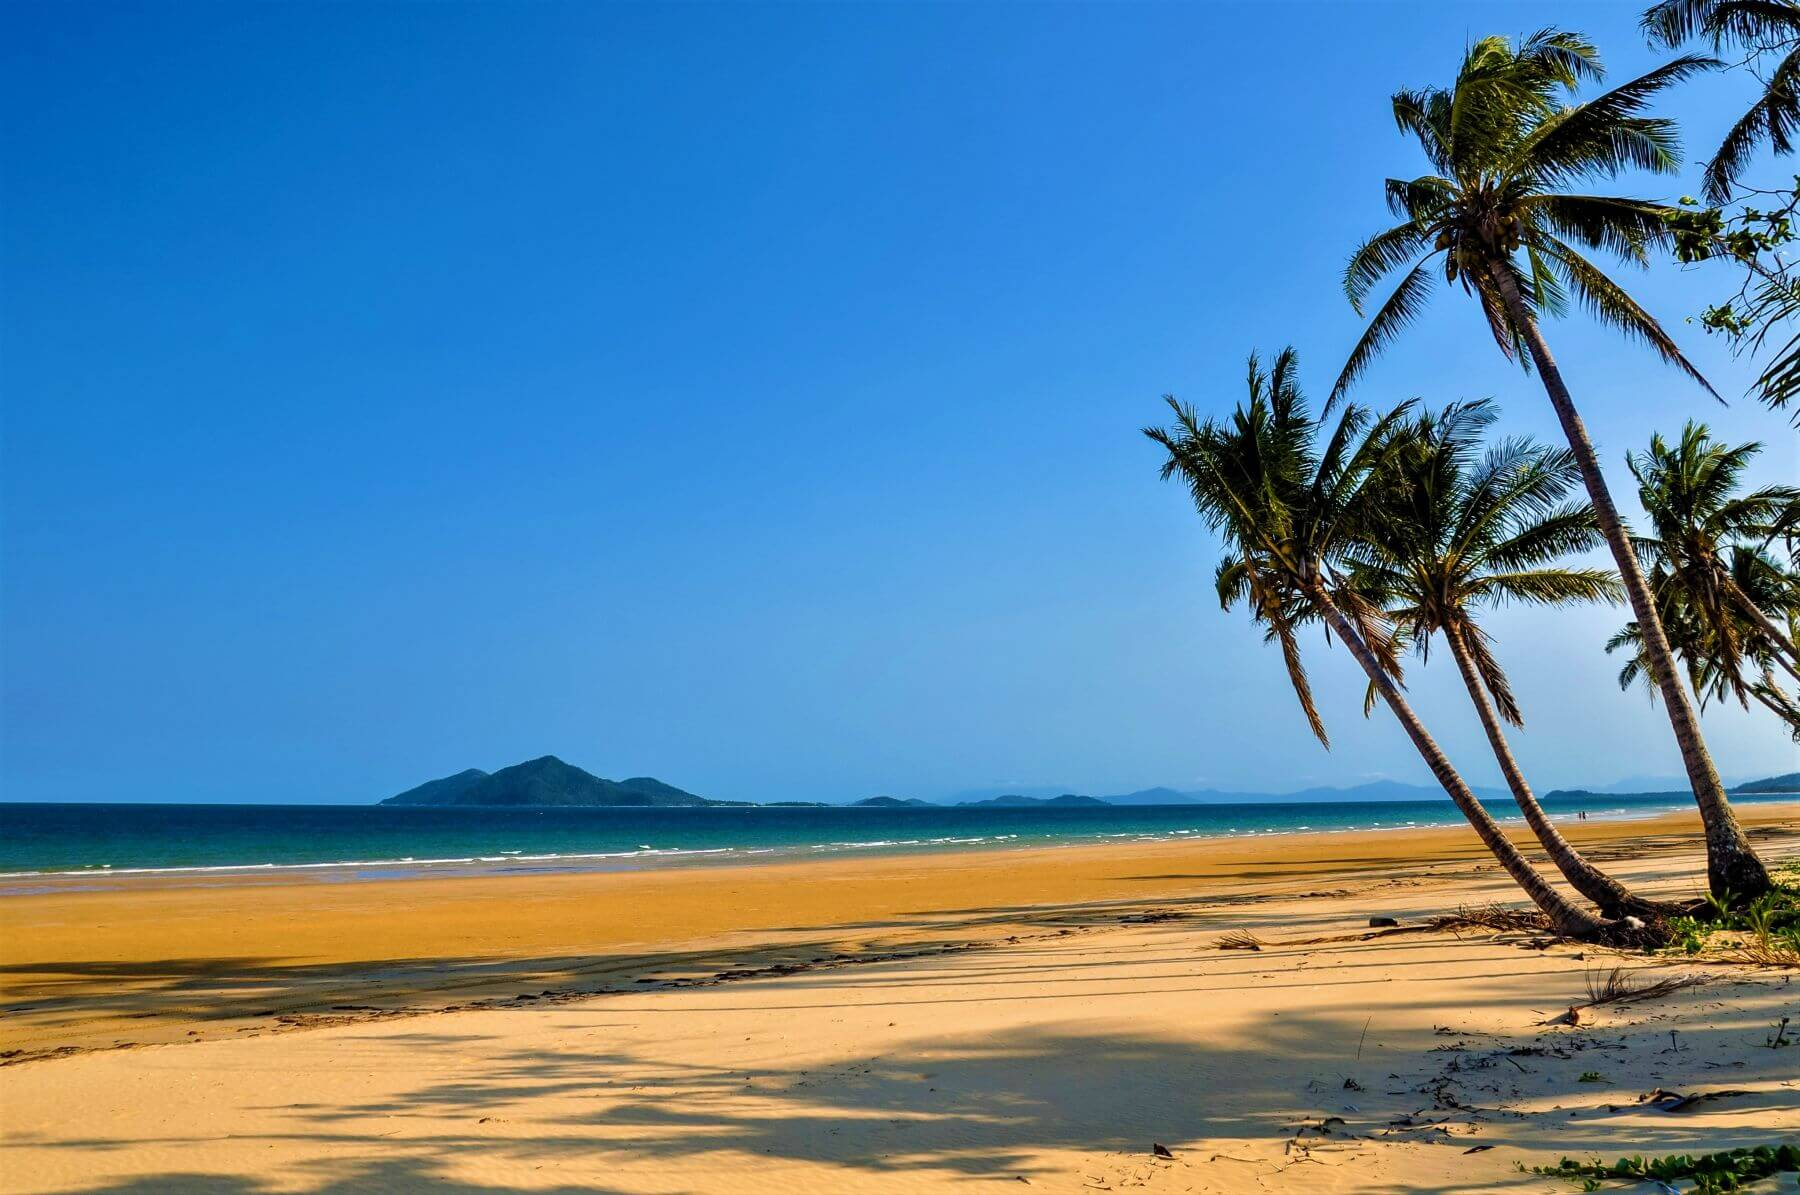 Mission Beach in Australien